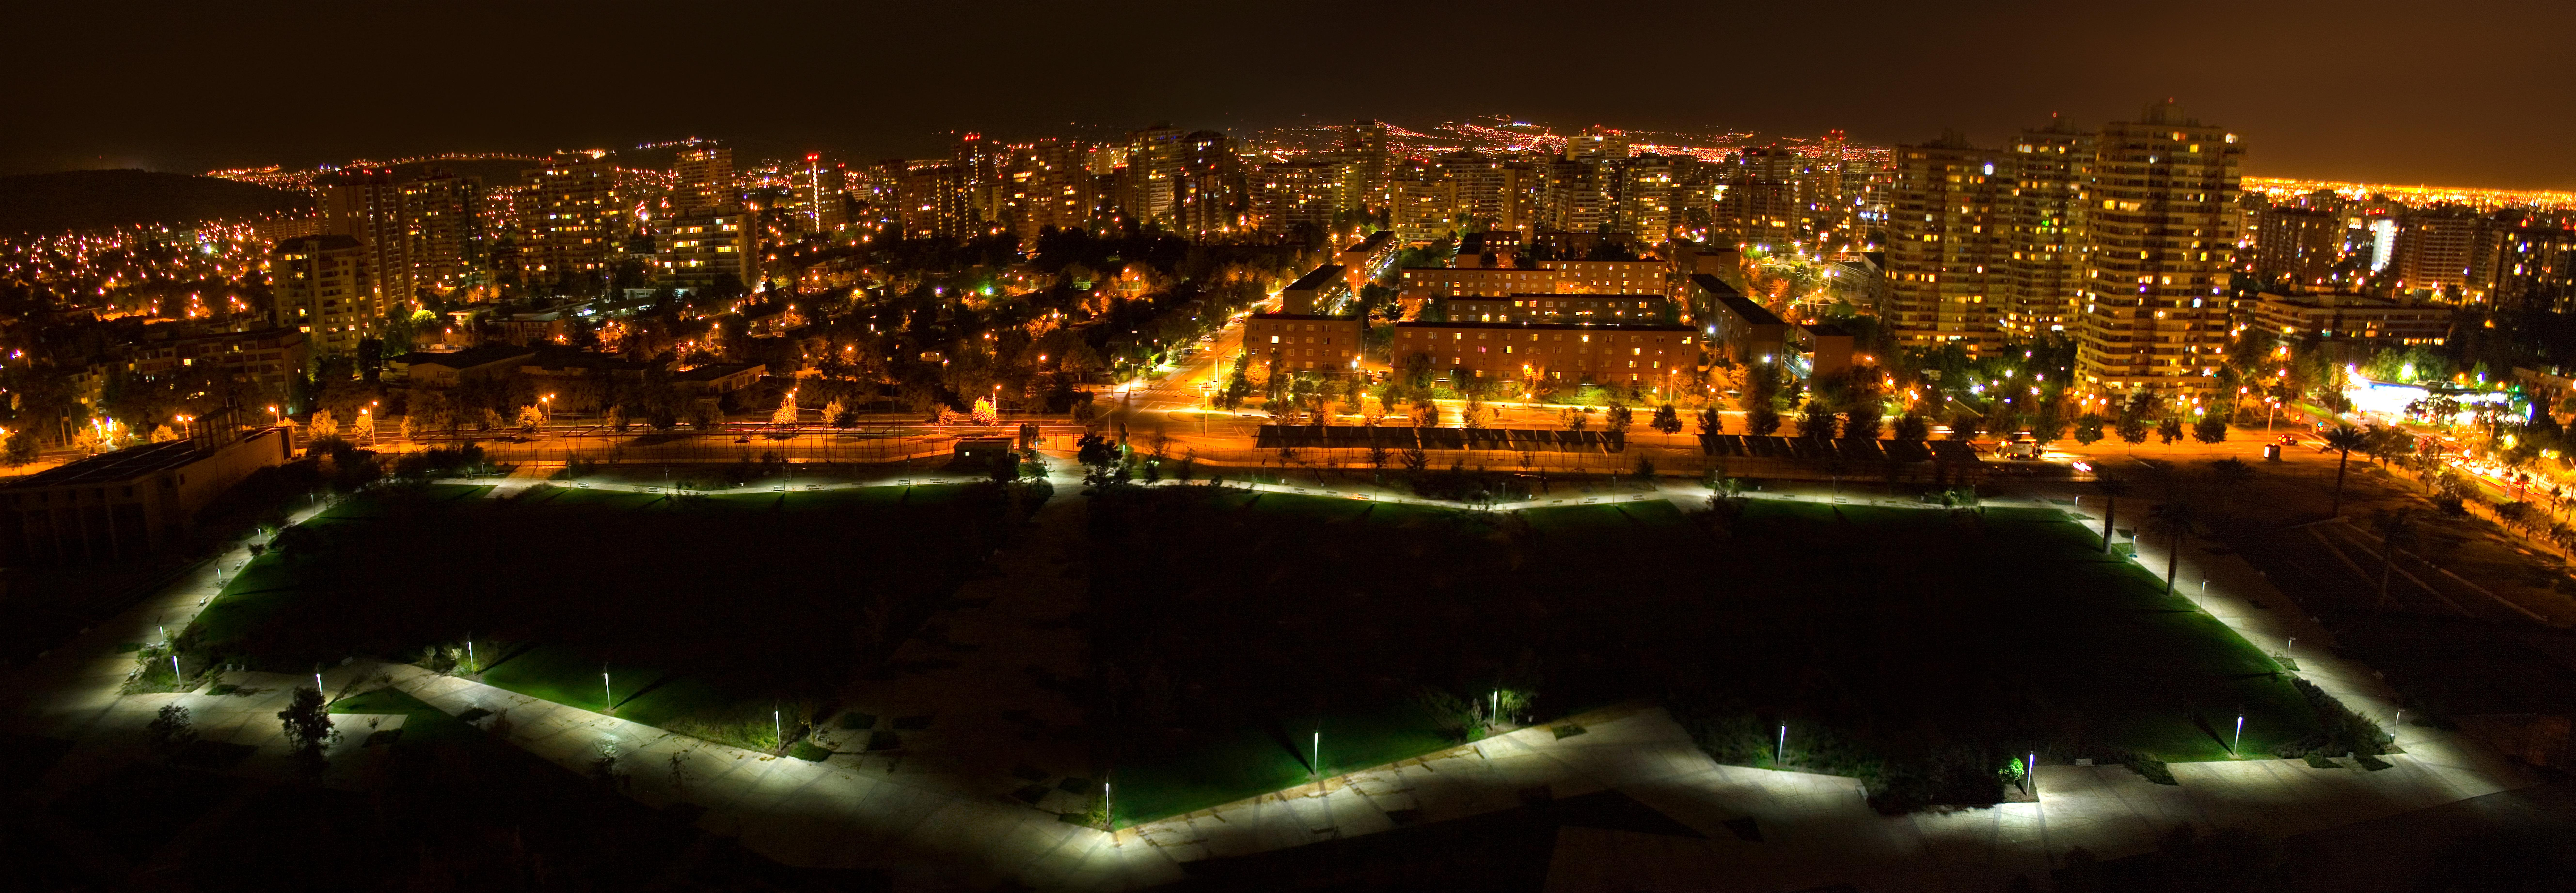 Solar park lighting in Chile